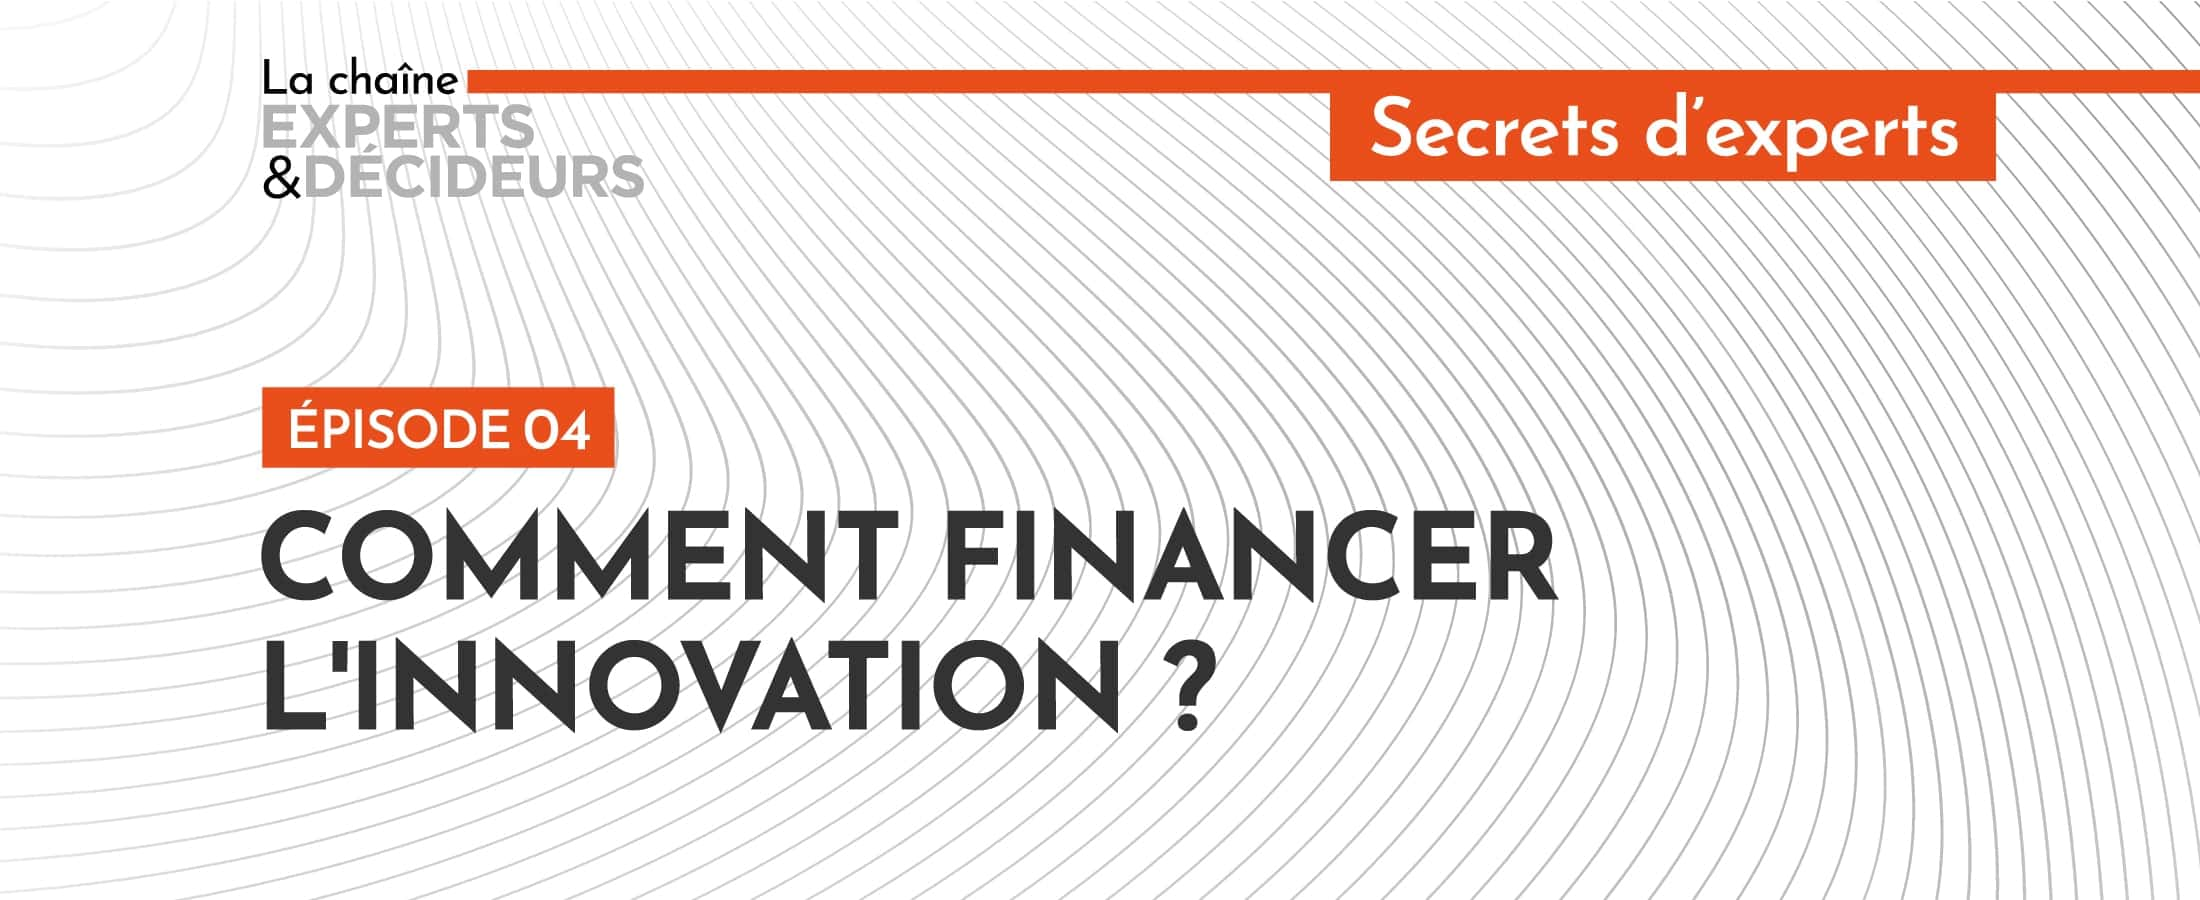 [Podcast] Comment financer l'innovation?